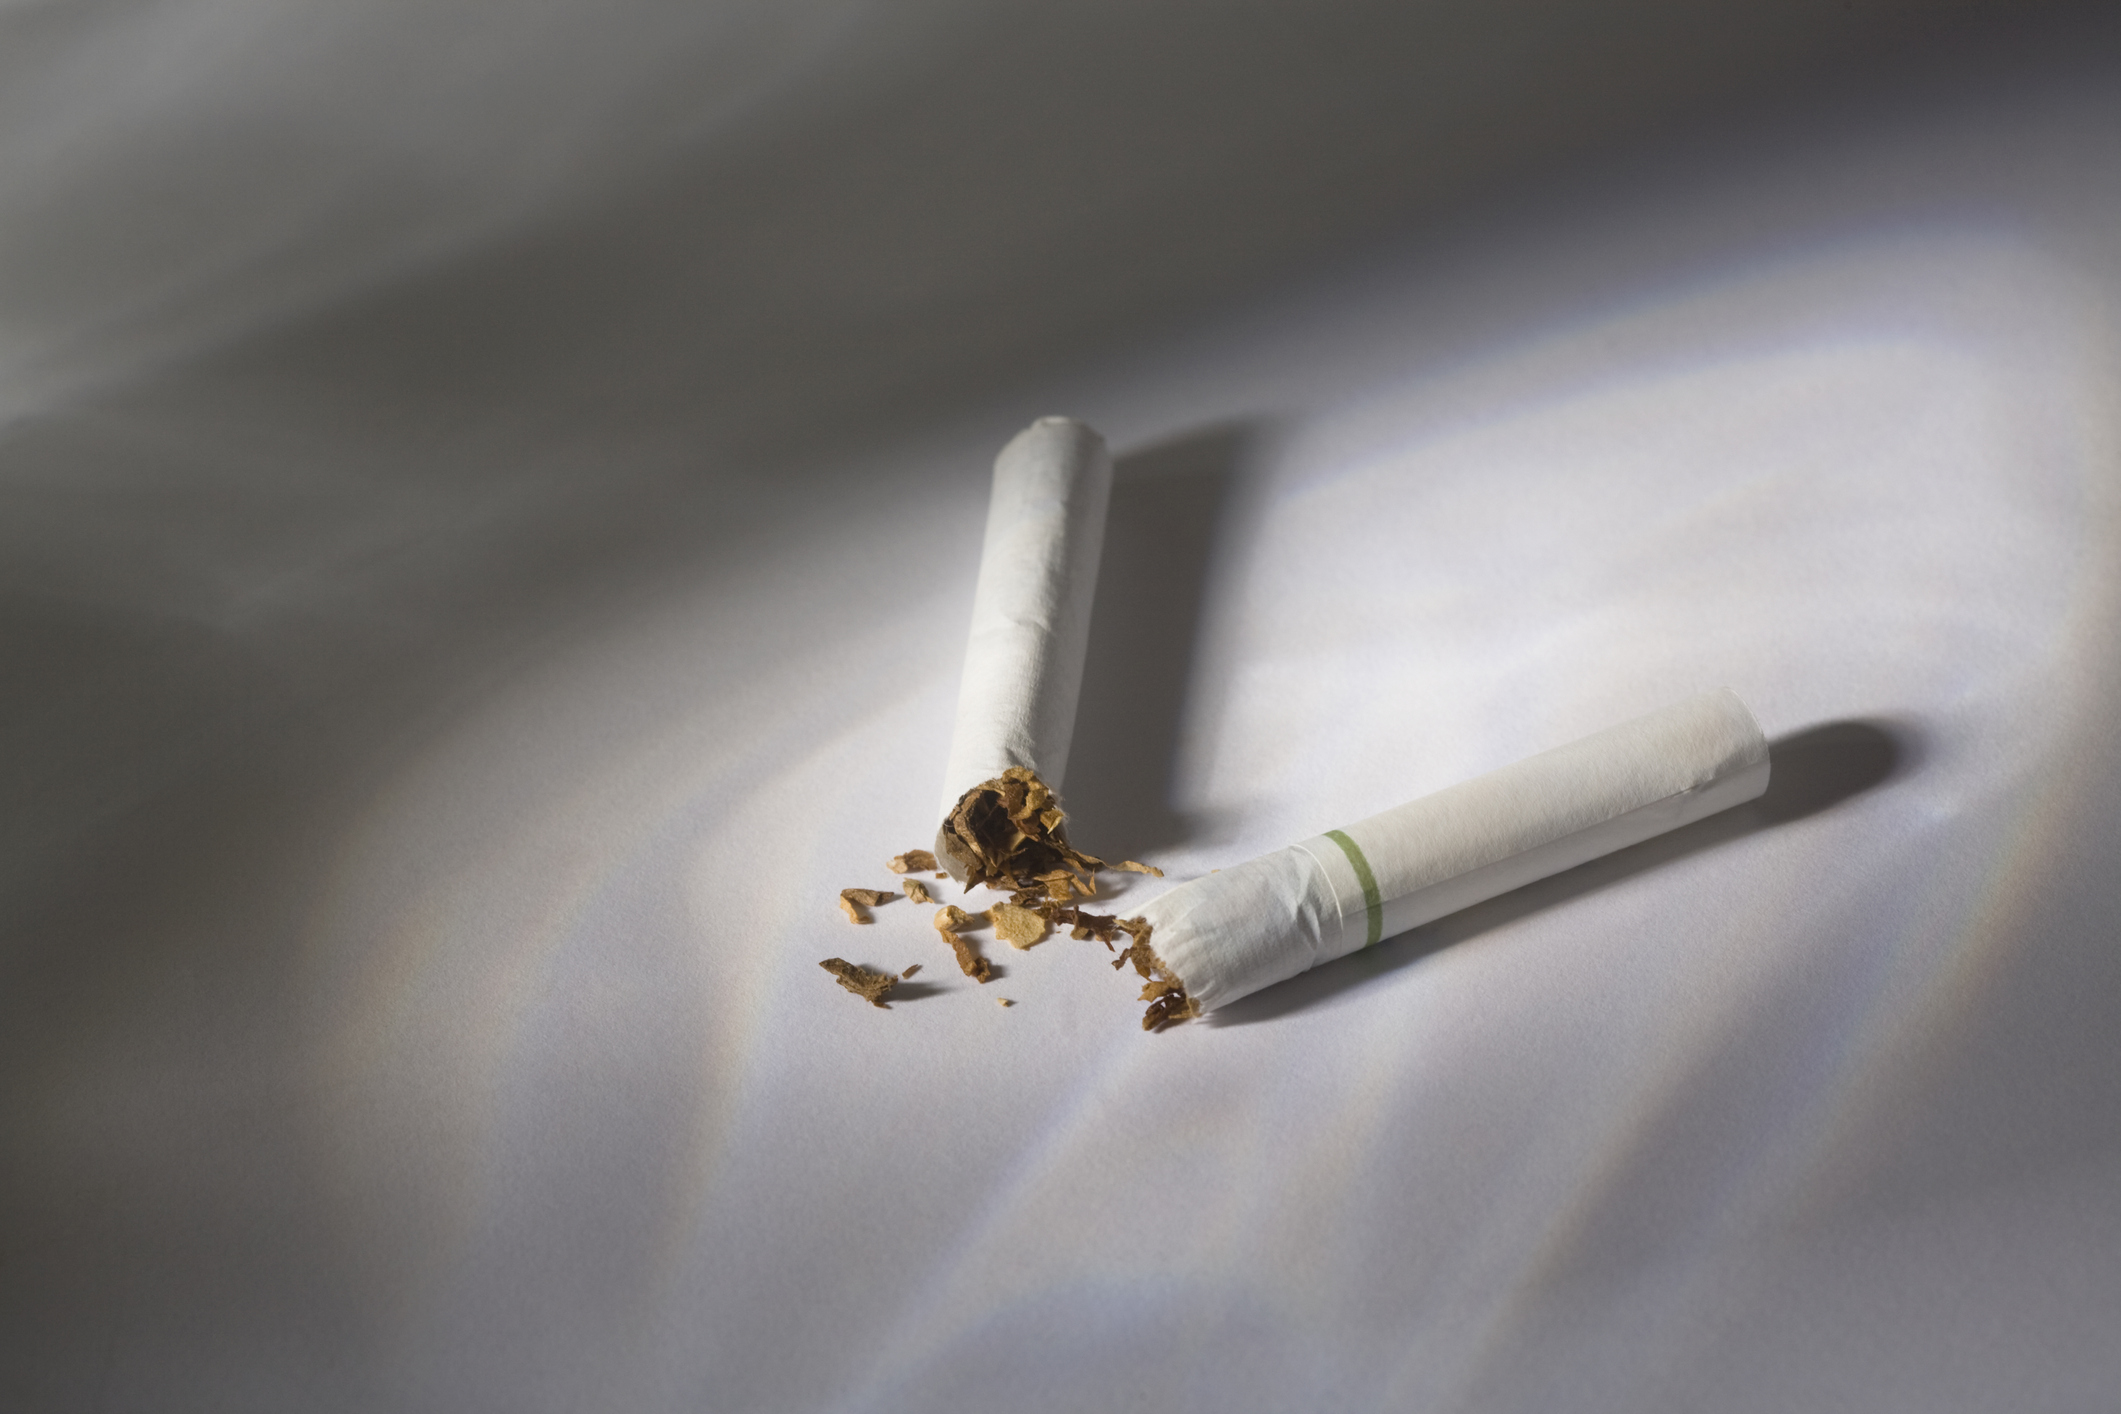 A cigarette broken in two.